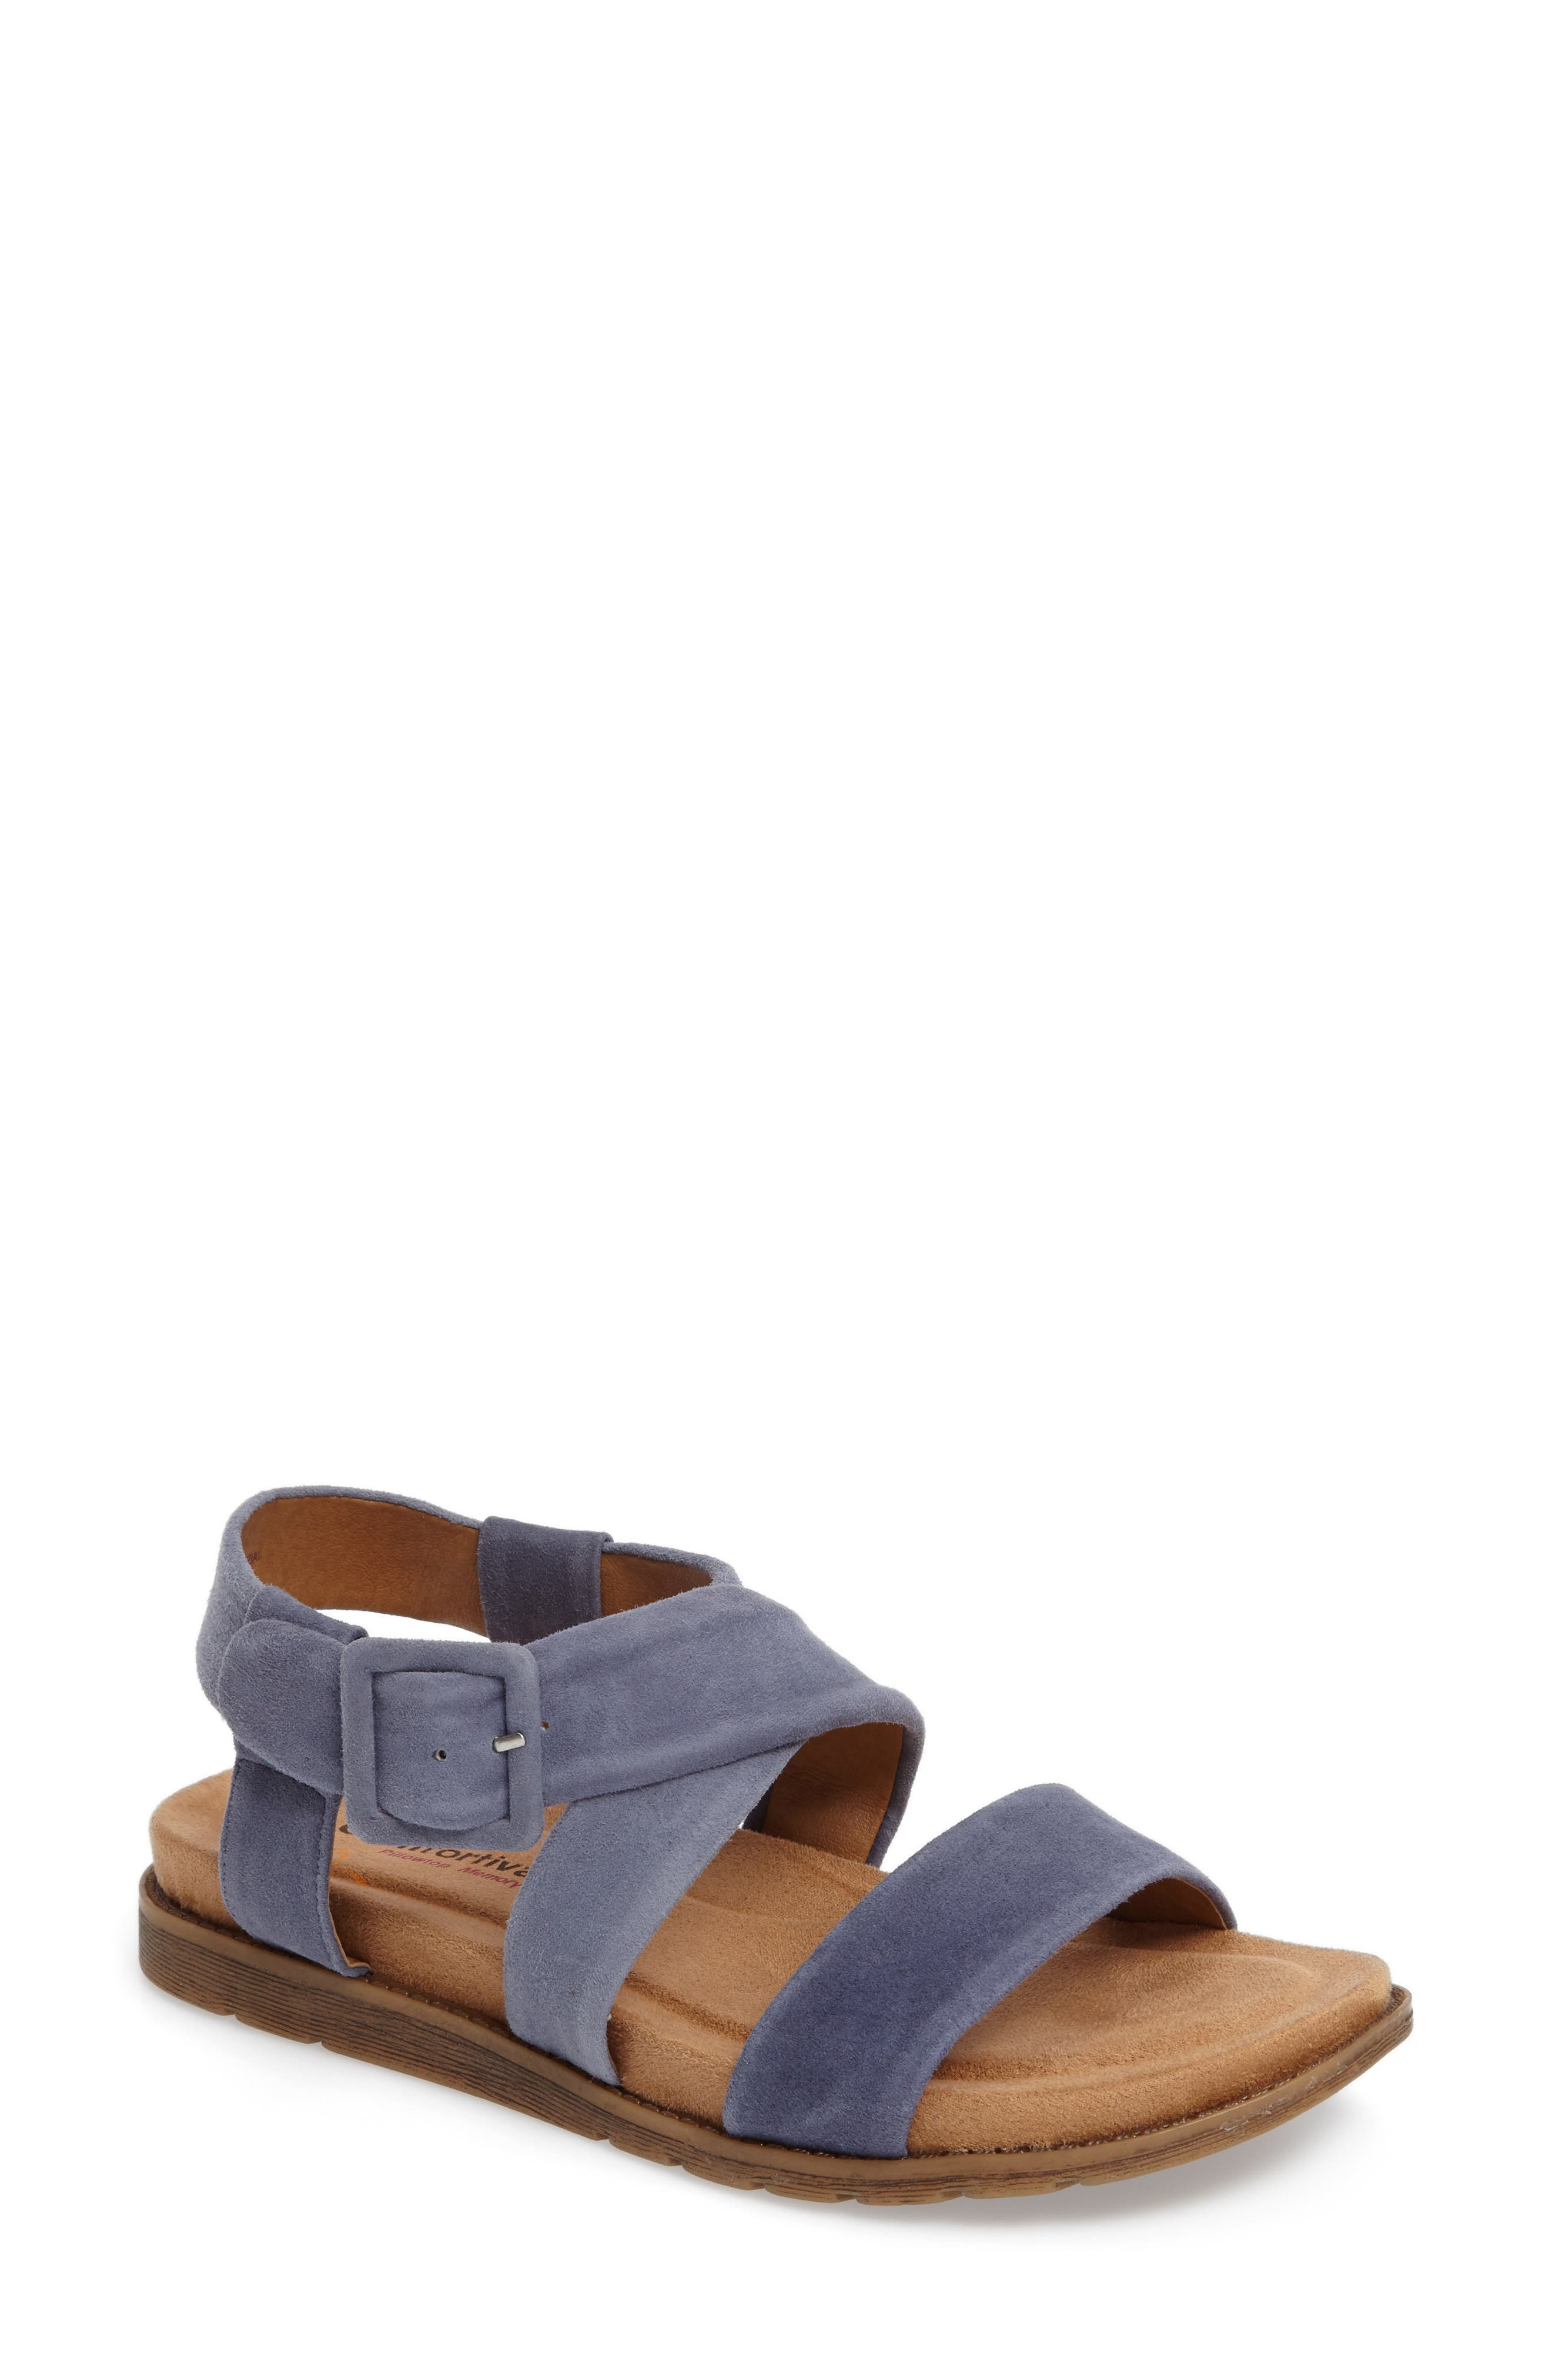 Andria Sandal,                         Main,                         color, 420